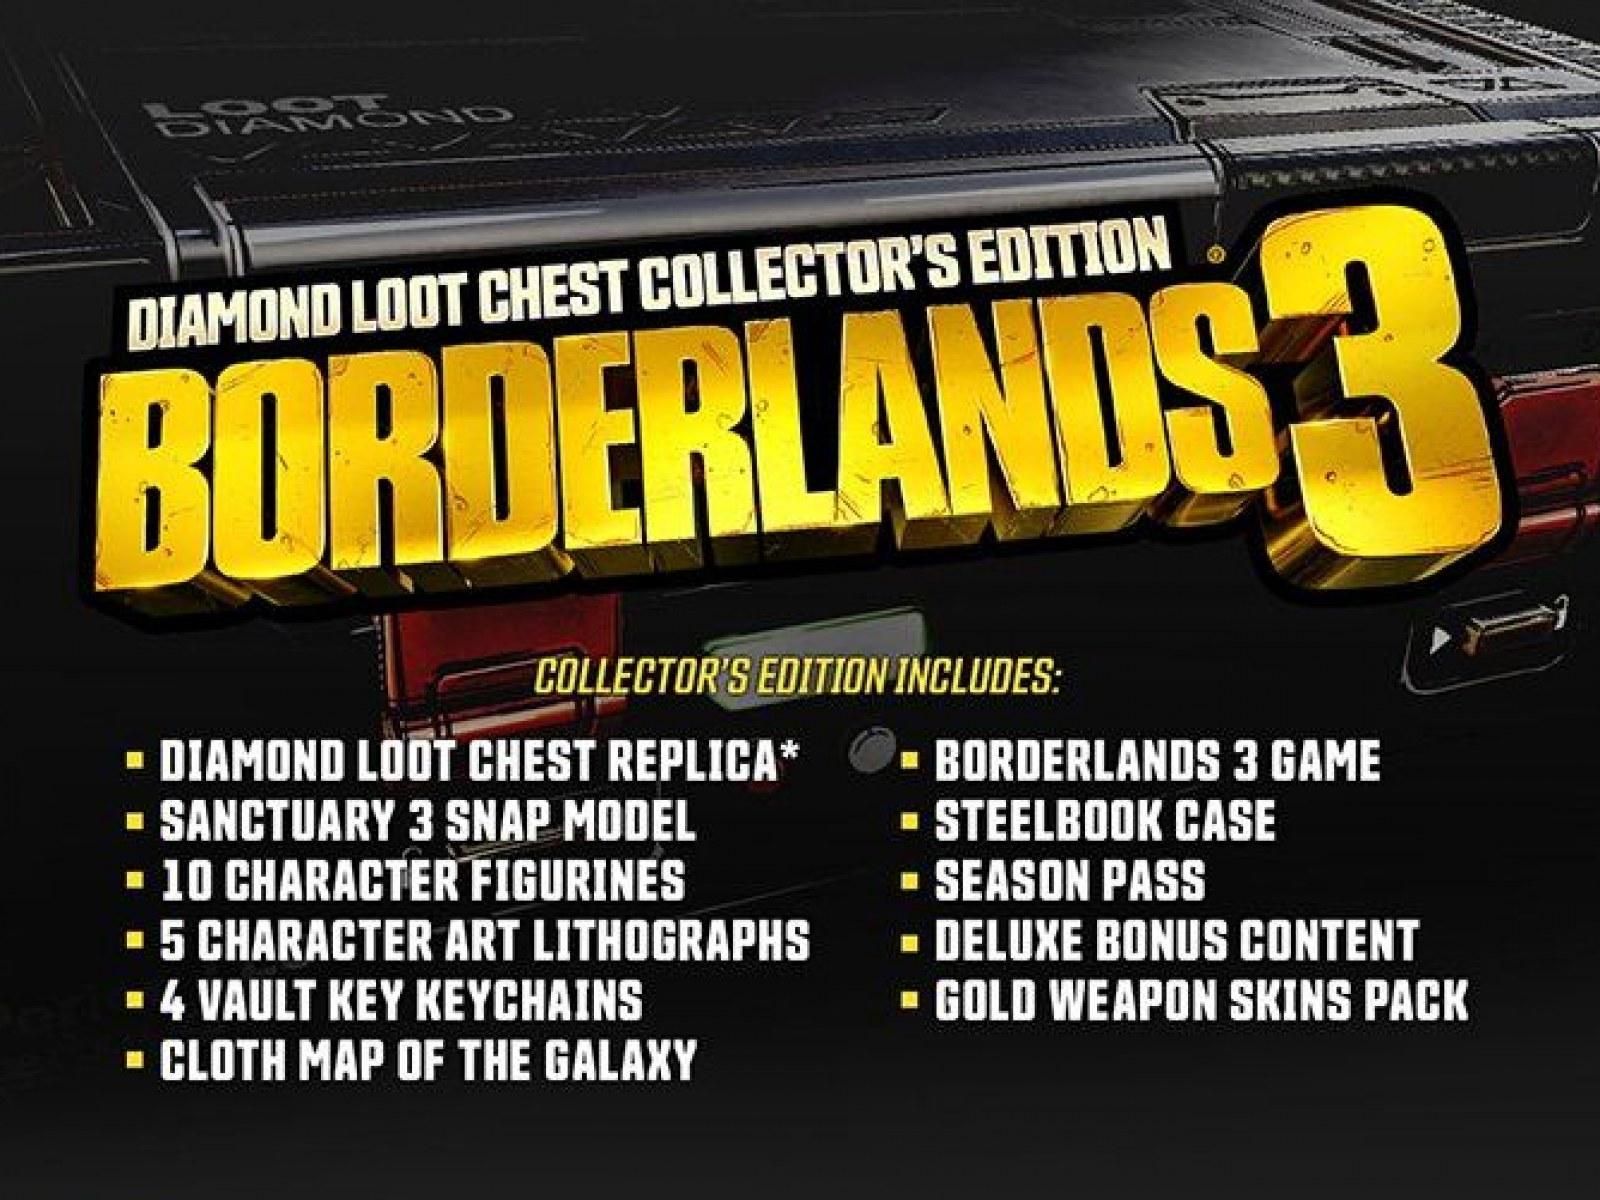 Borderlands 3' Pre-Orders: Bonuses, Editions, Box Art and More